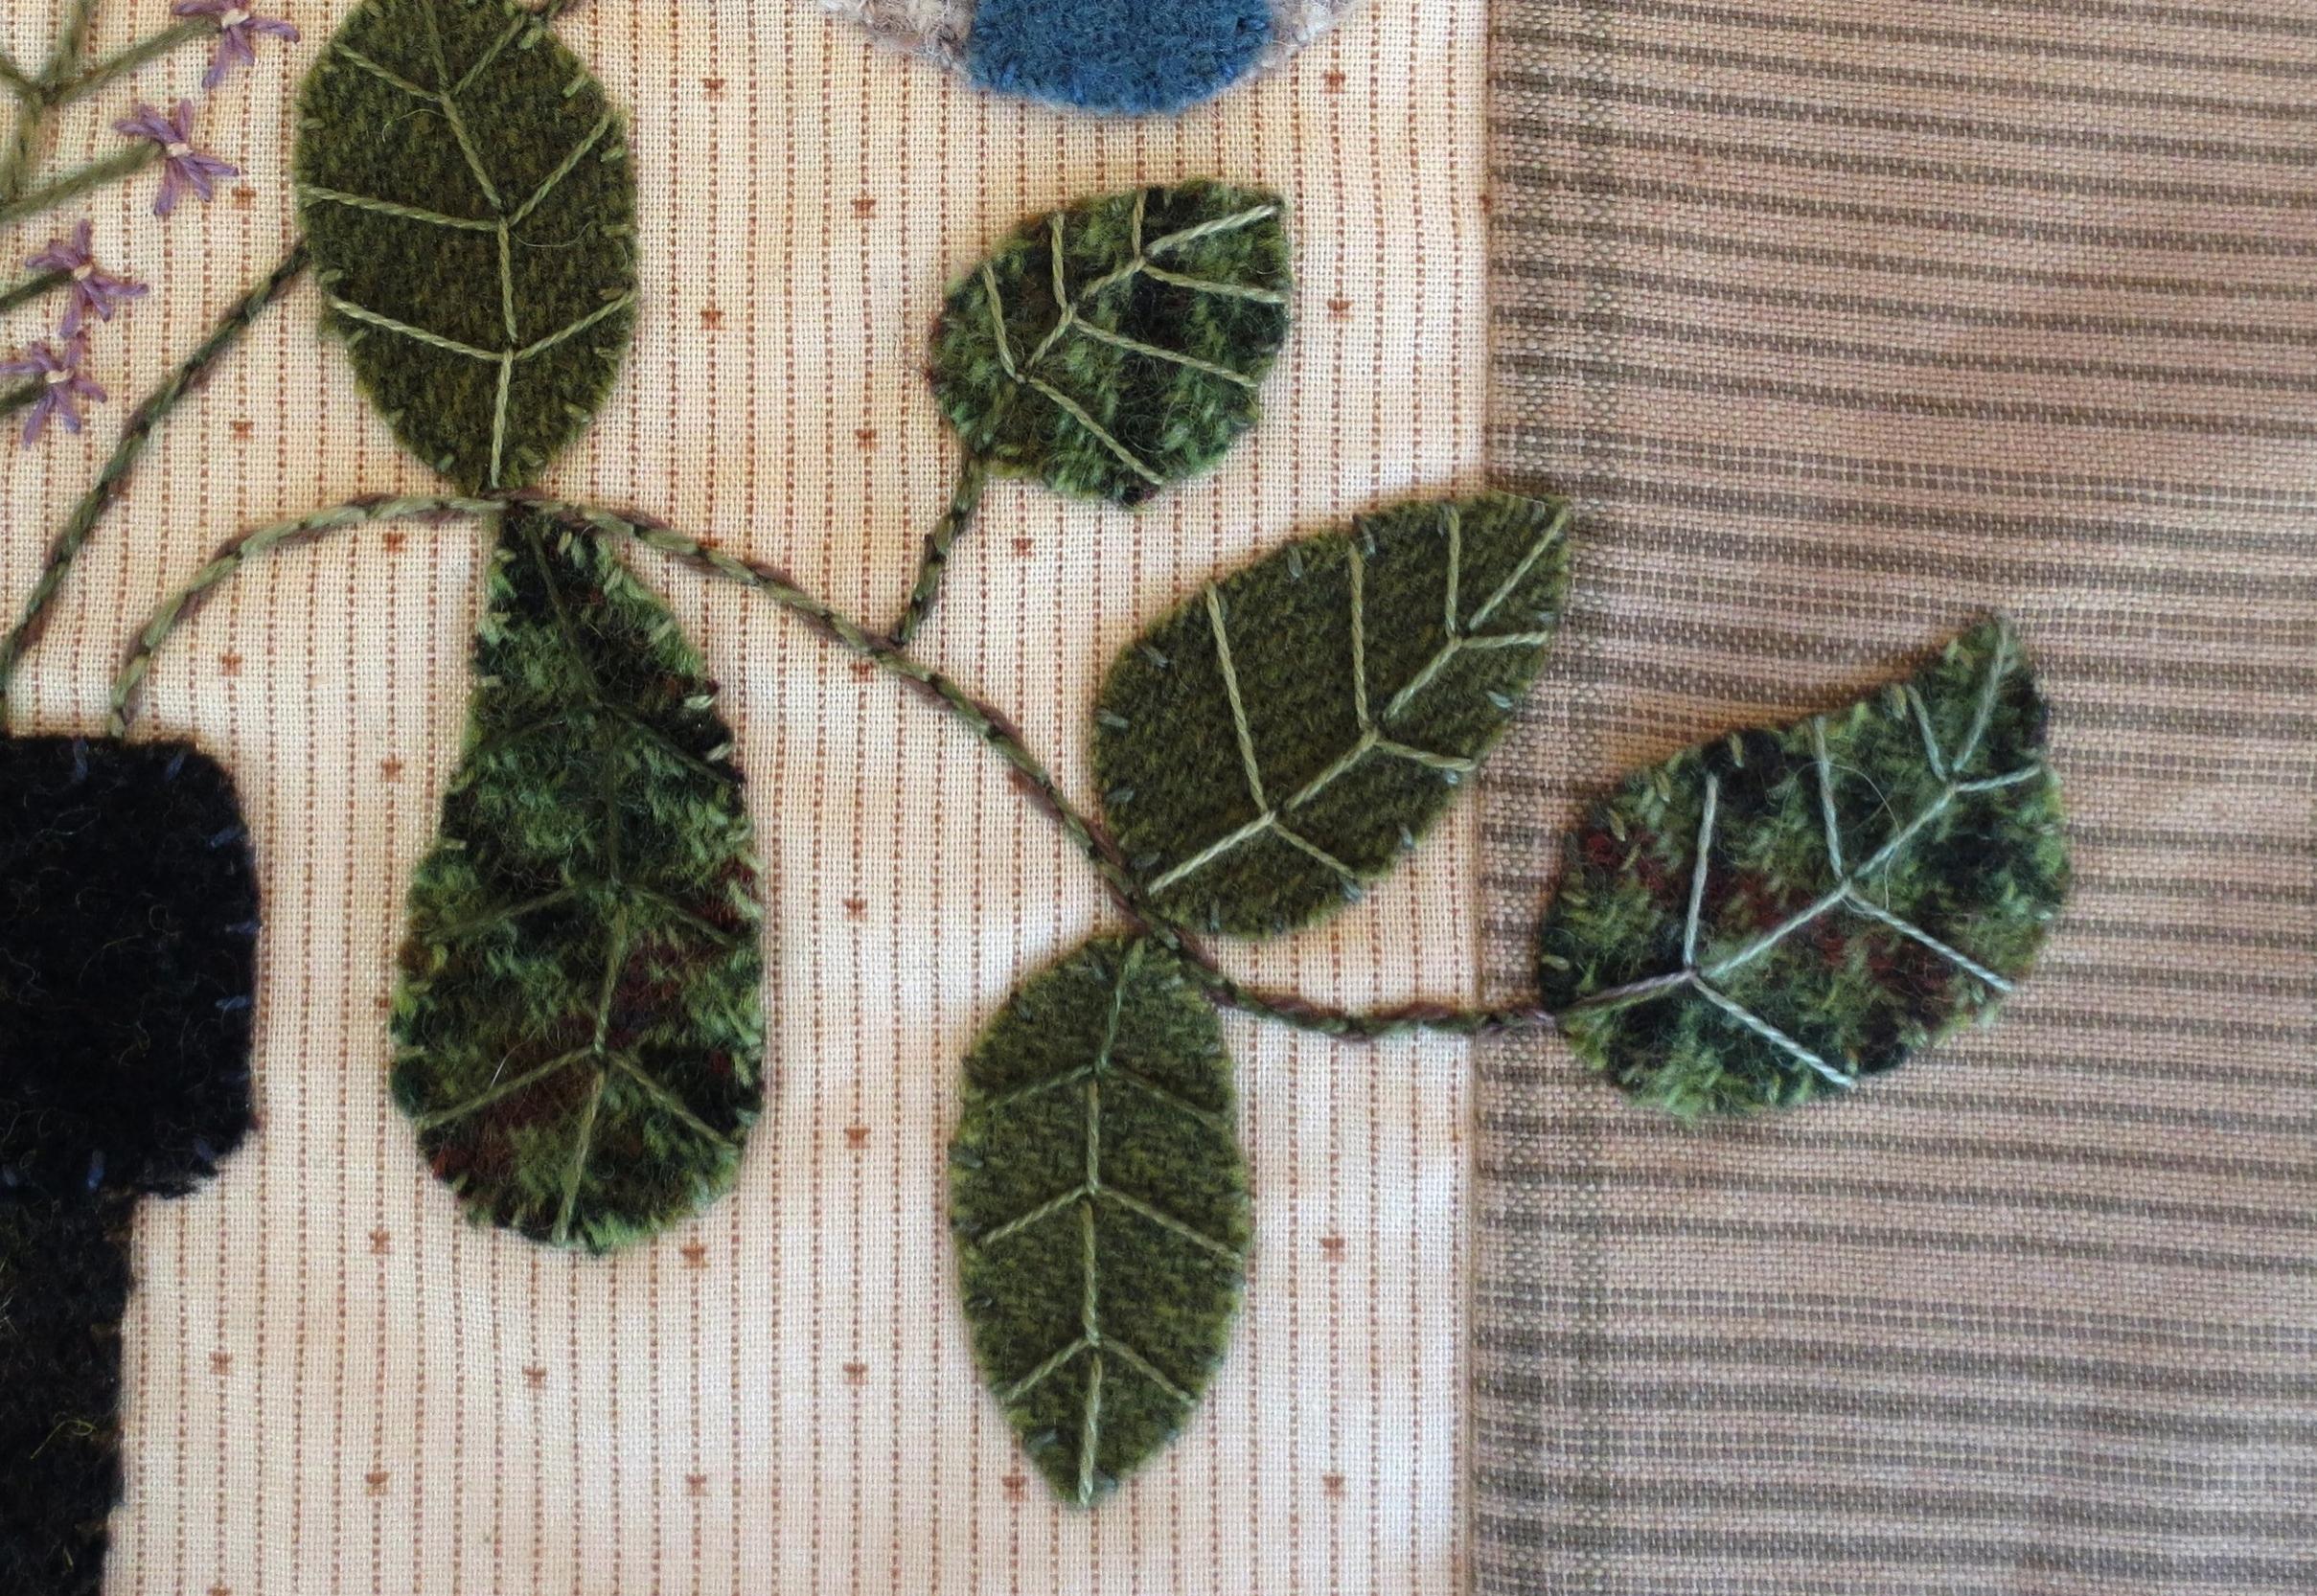 block #2 right side leaf veins.jpg